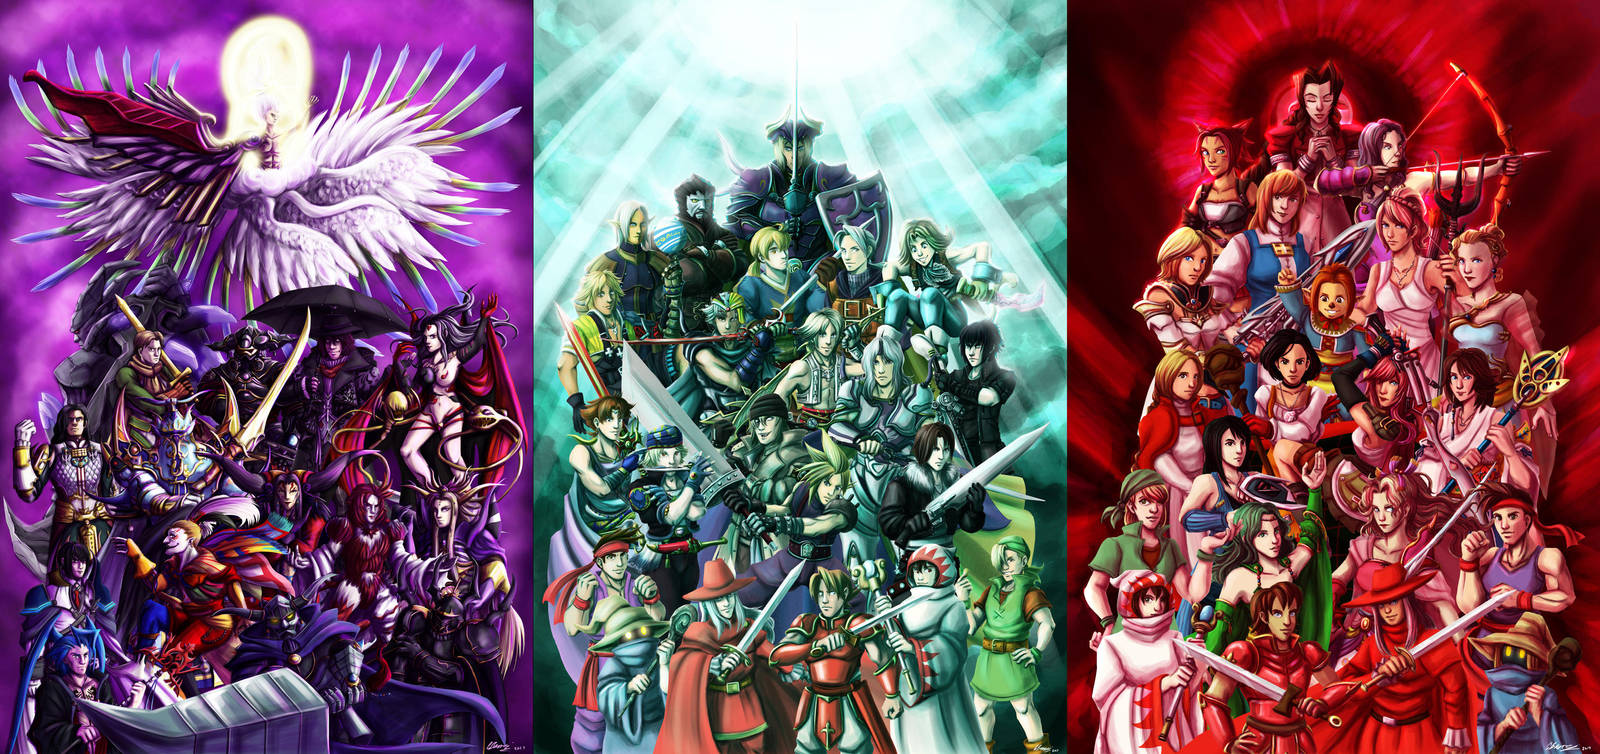 Final Fantasy: Villains, Heroes and Heroines by ryuuza-art